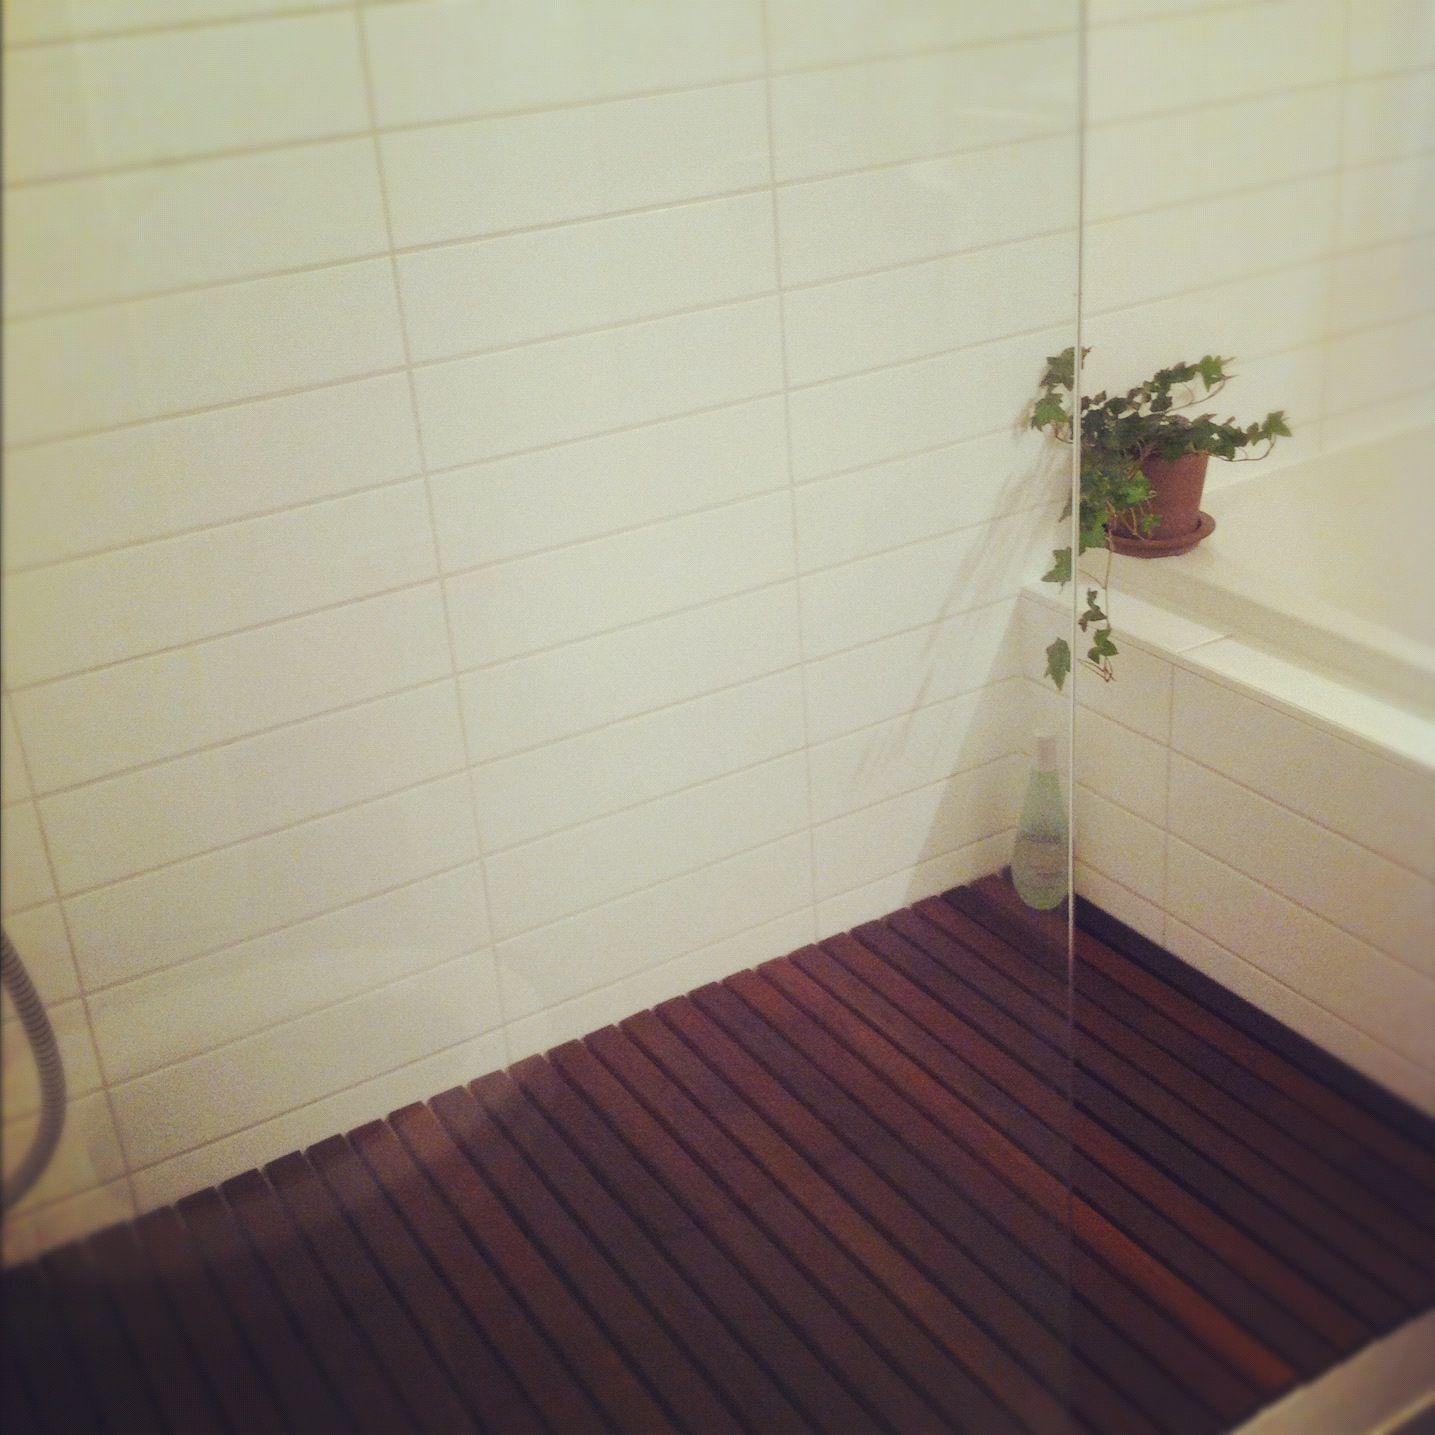 Kids Bathroom Flooring For Mom And Dad Diy Ipe Shower Floor Miscellaneous House Ideas